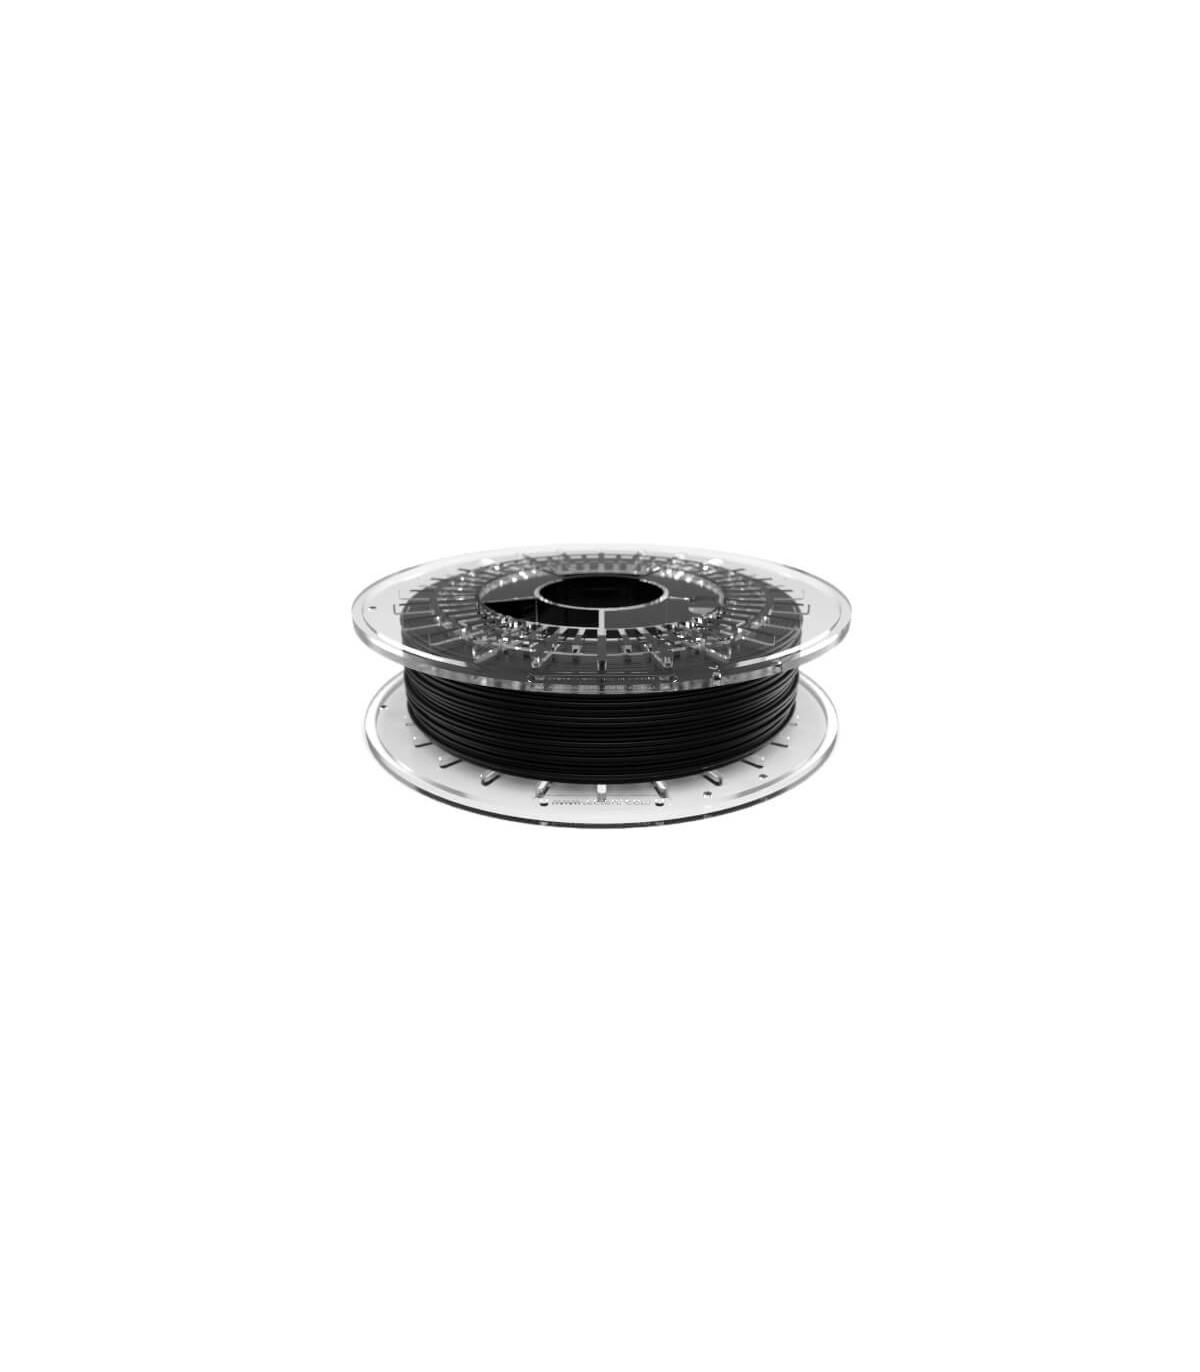 FilaFlex  Black 82A 82A TPE Filament 2.85 mm 500g